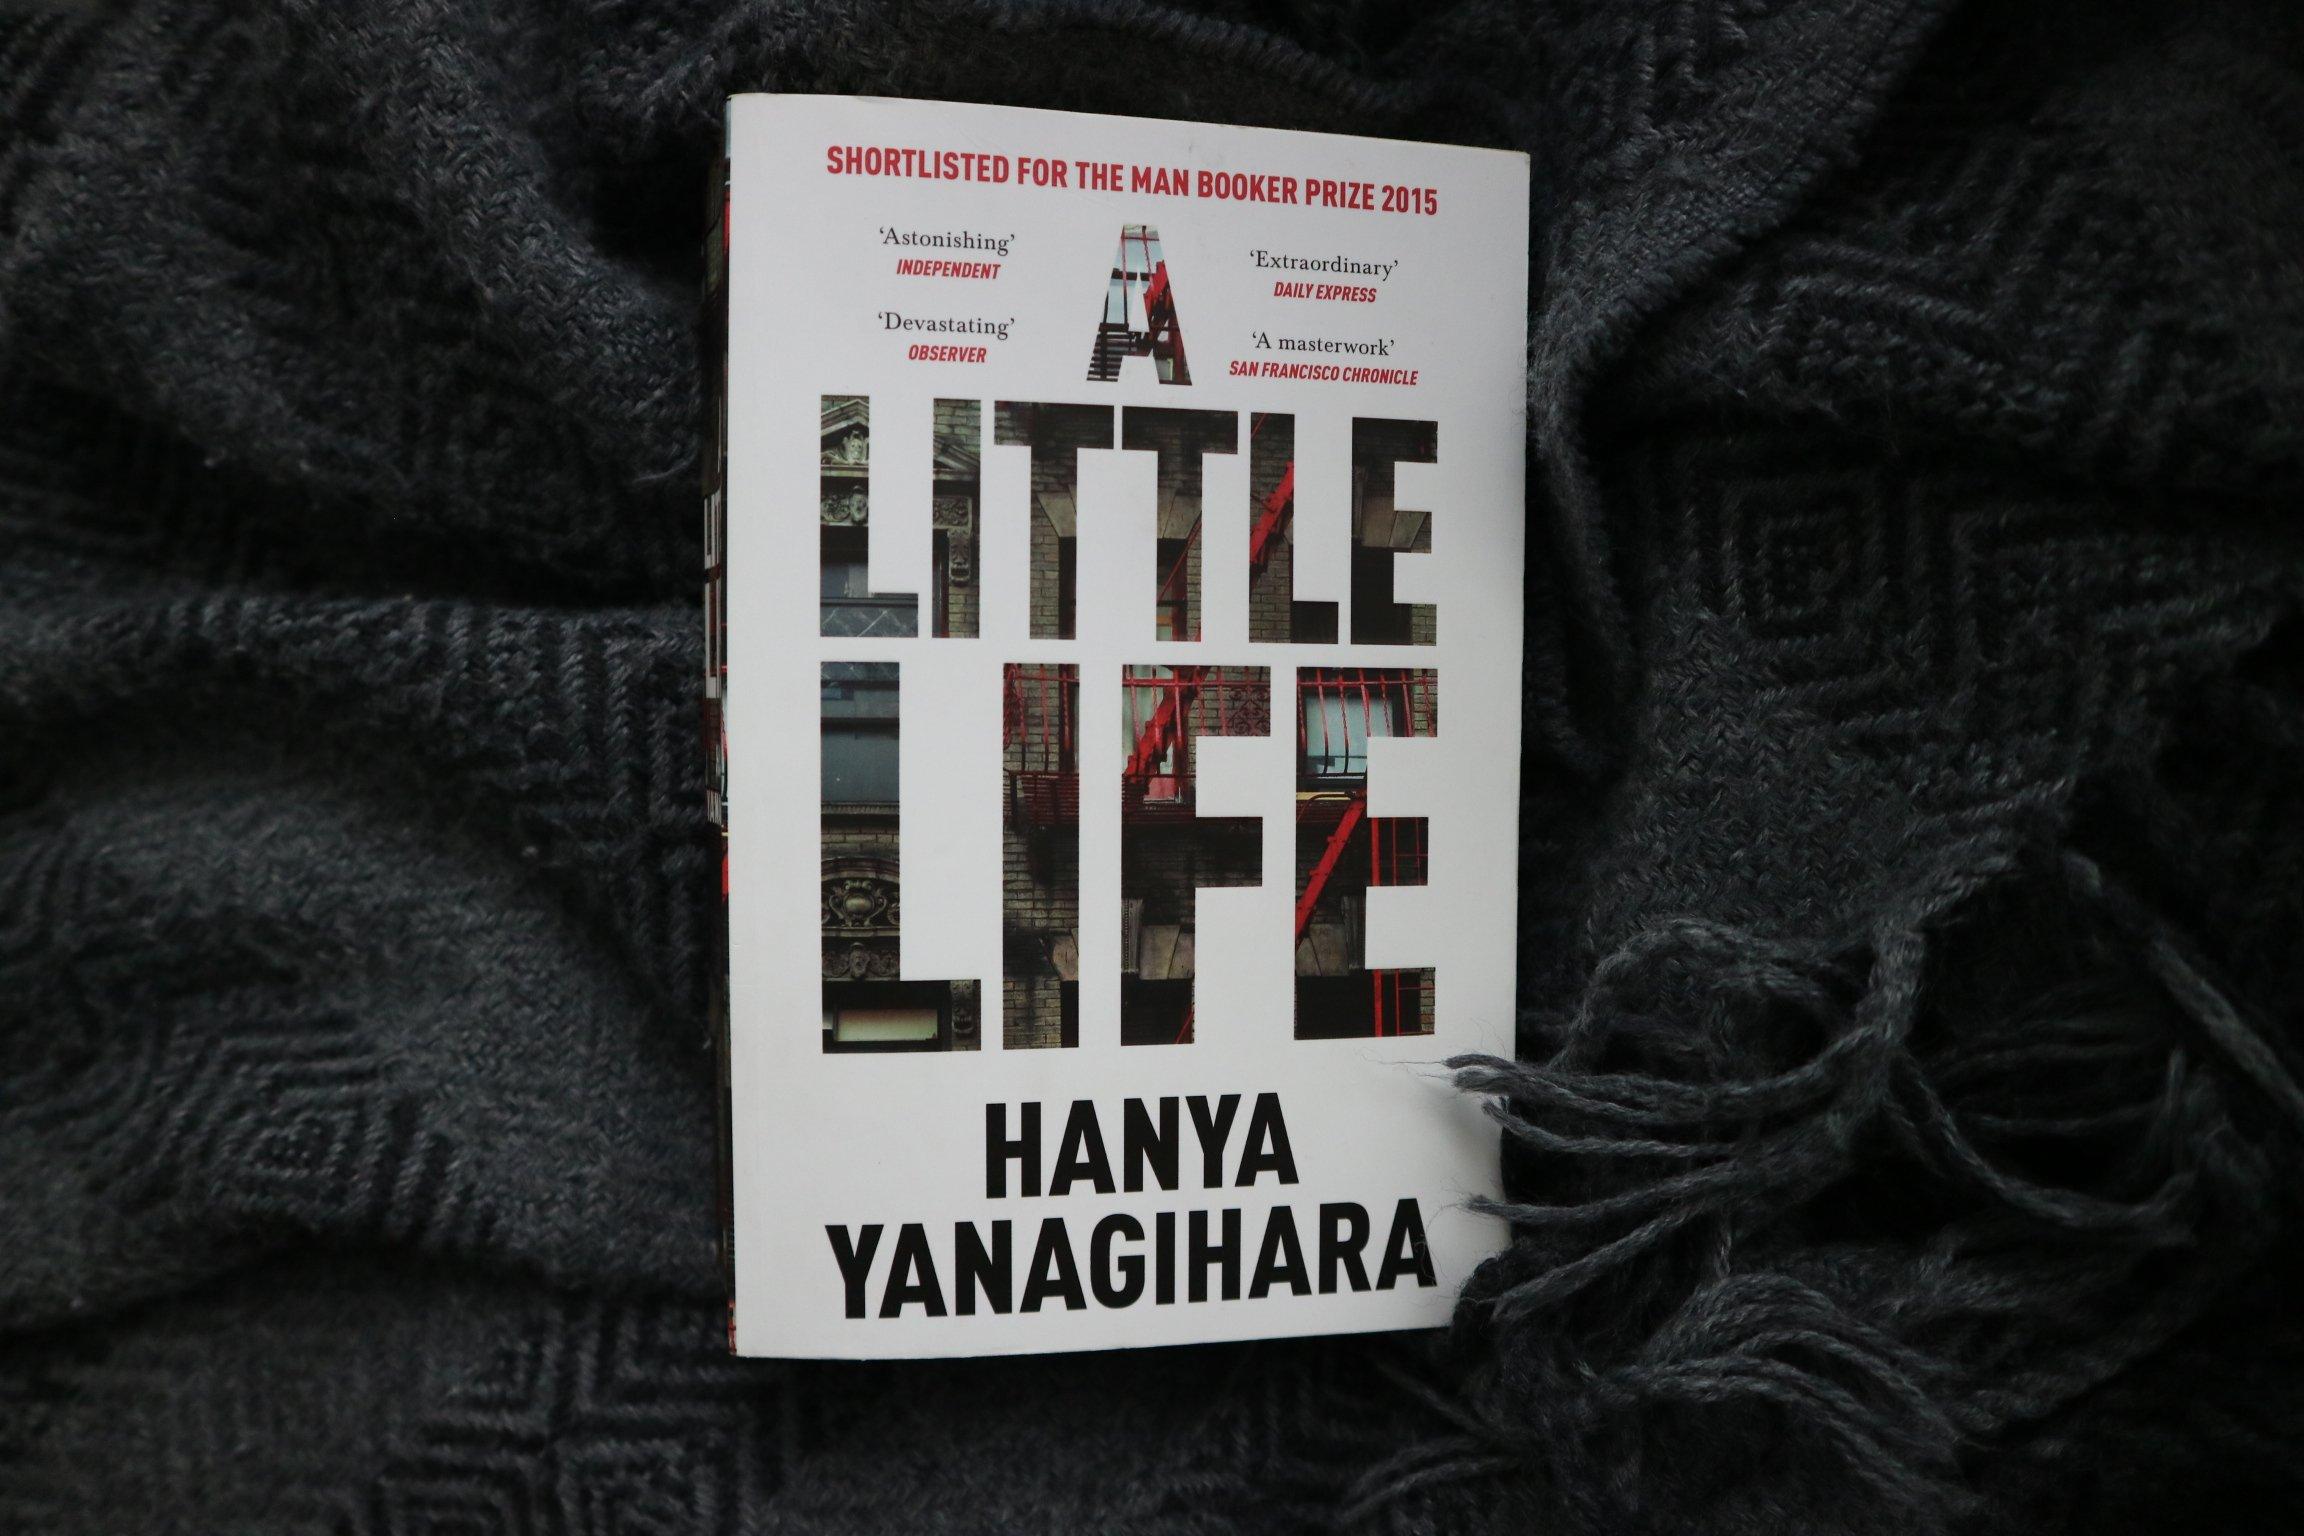 Paperback copy of A Little Life by Hanya Yanagihara on a grey tasseled blanket